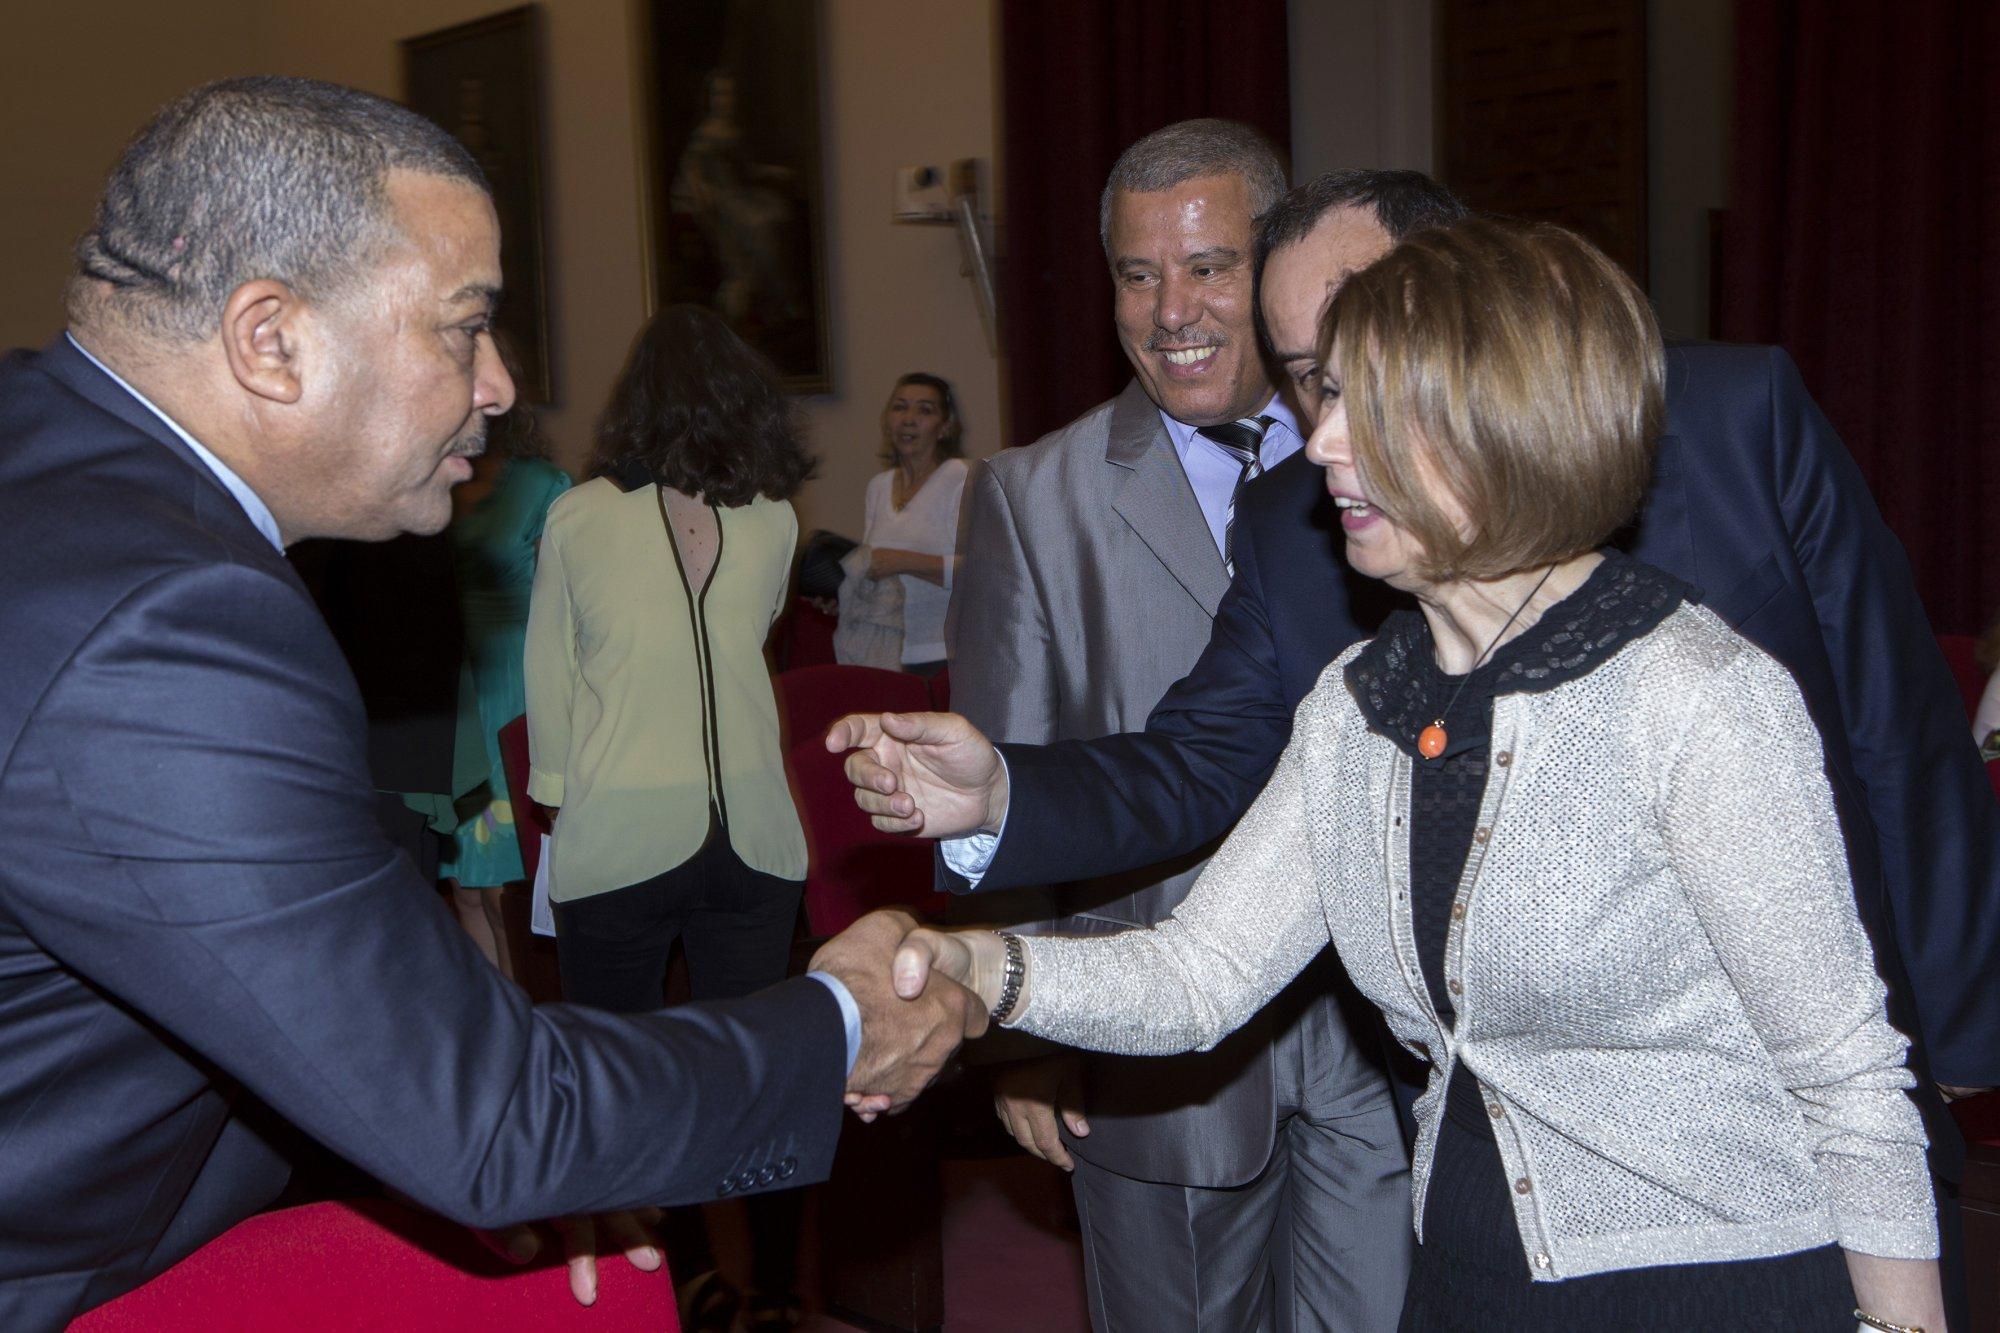 H.E Ms. Taous Feroukhi, Ambassador of Algeria and the Algerian Delegation